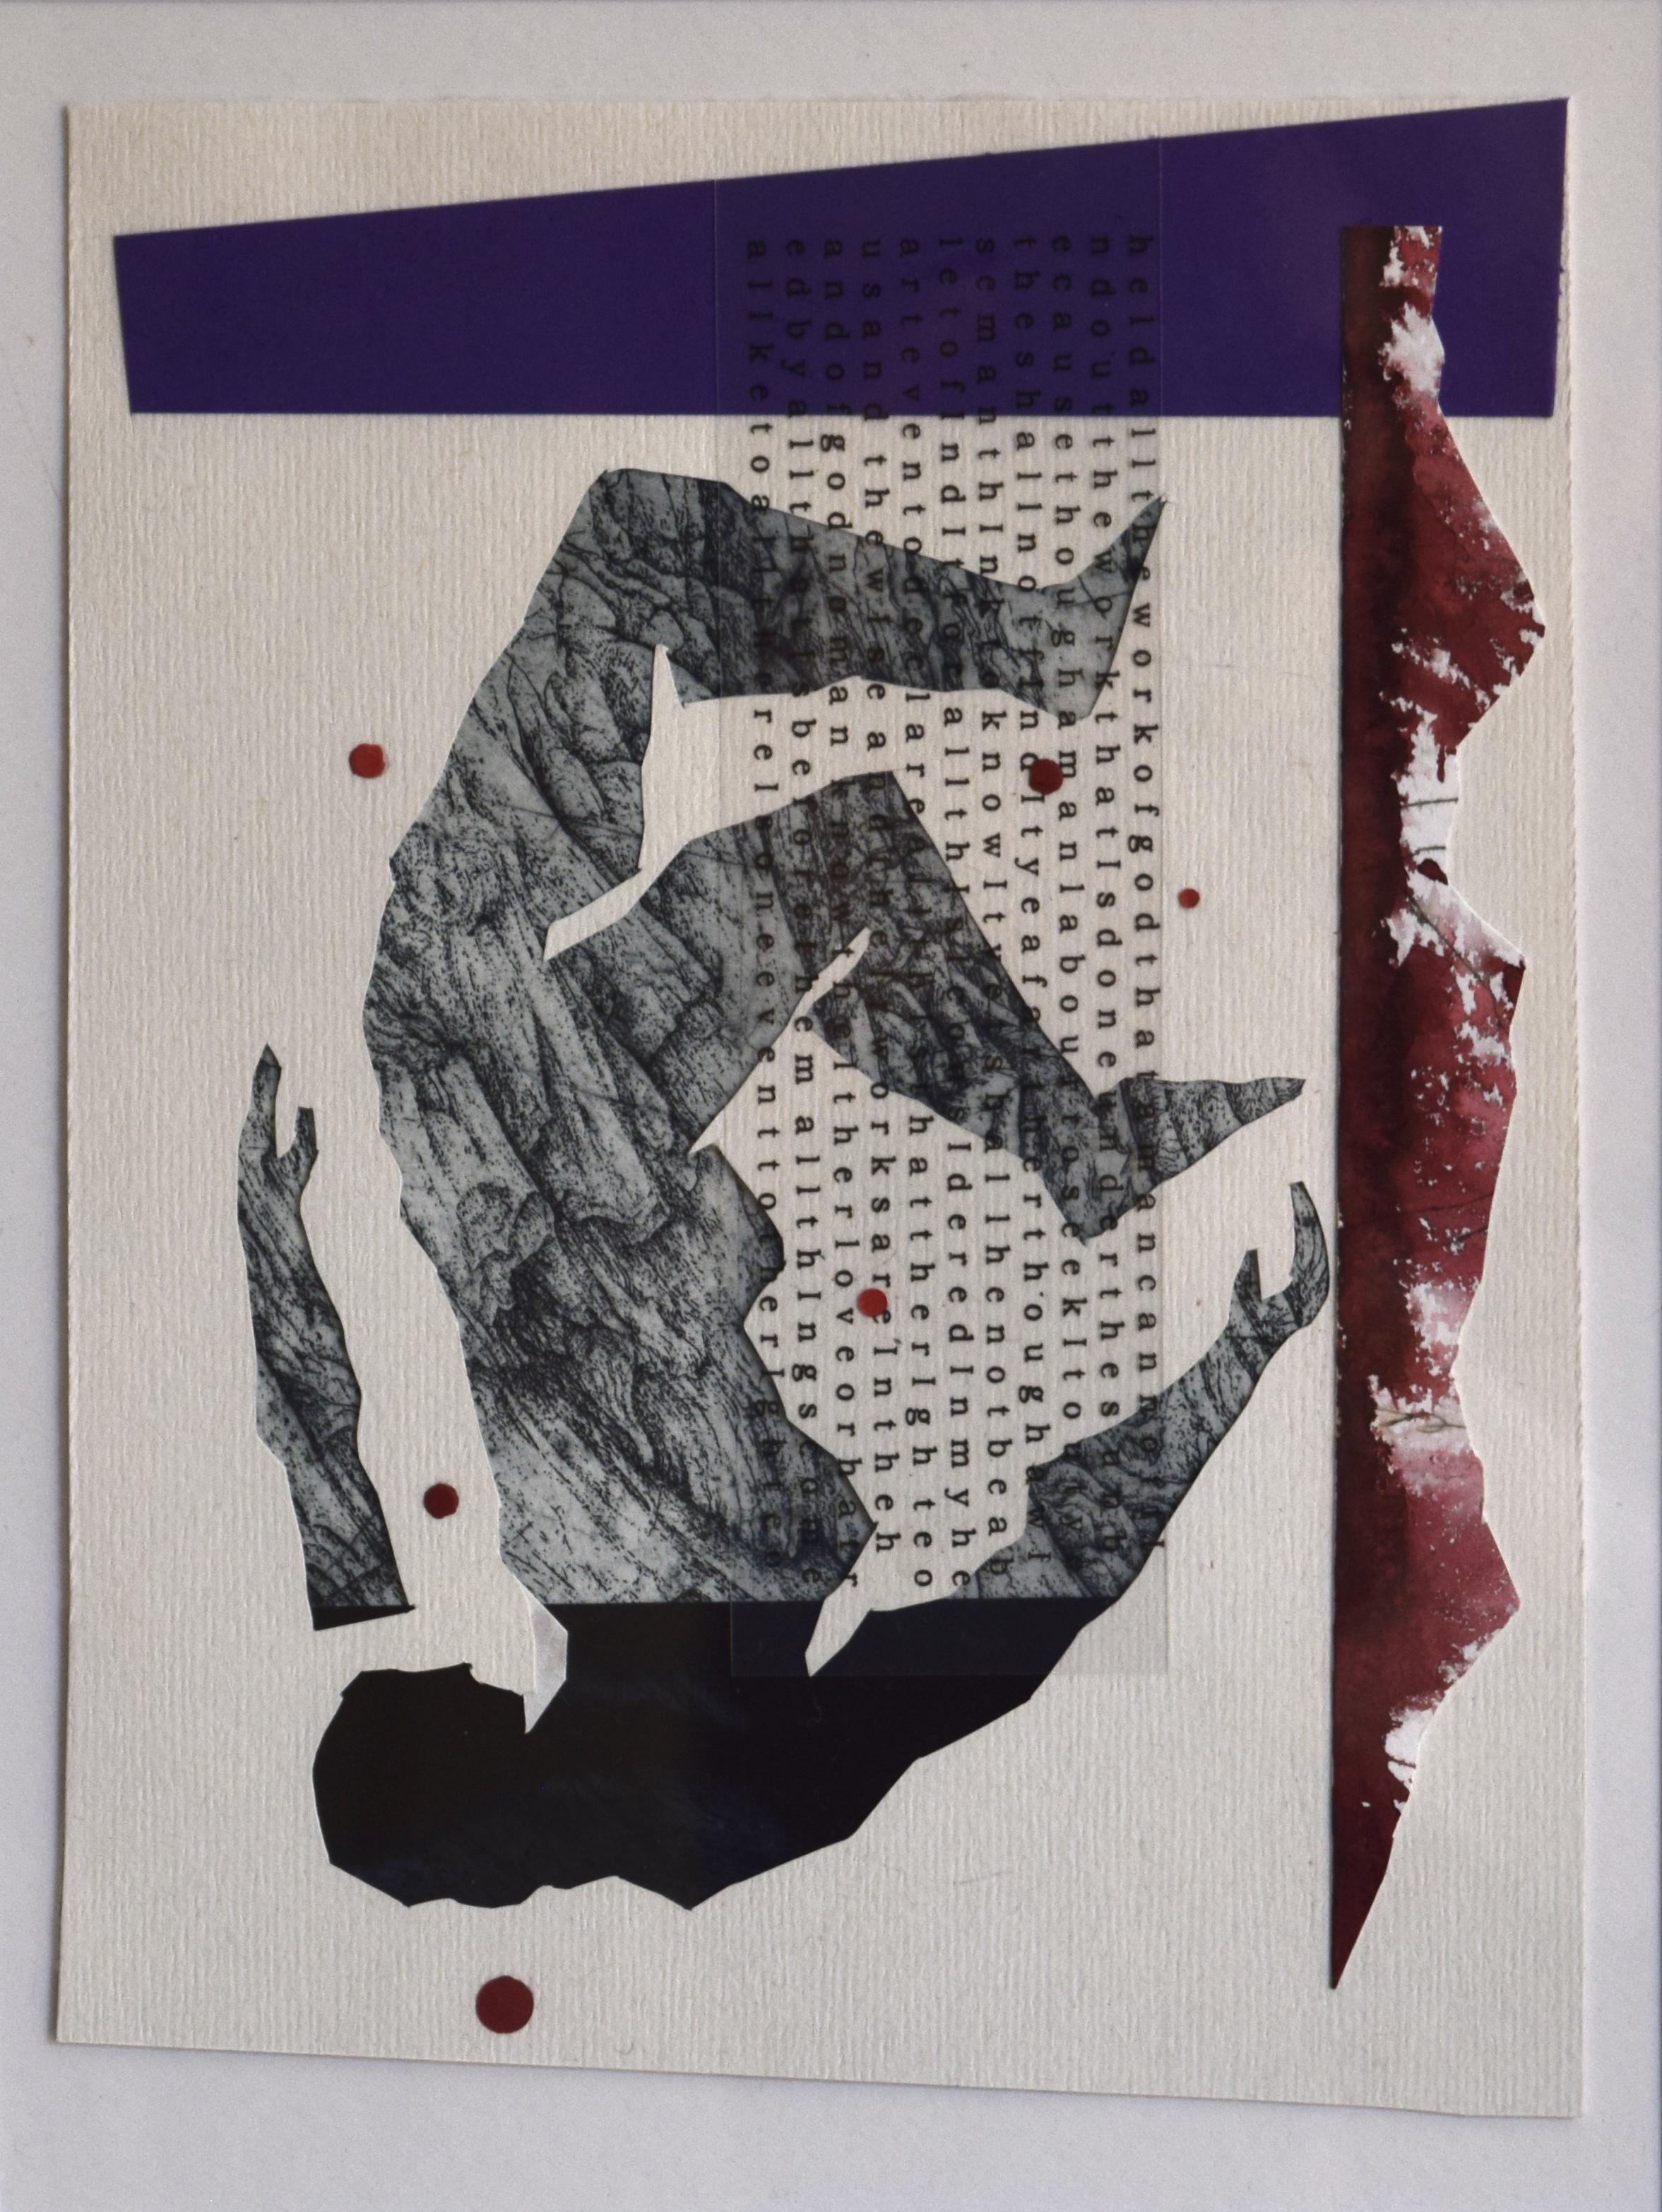 Tipping point II , John Pratt, woodcut/collage, 2018